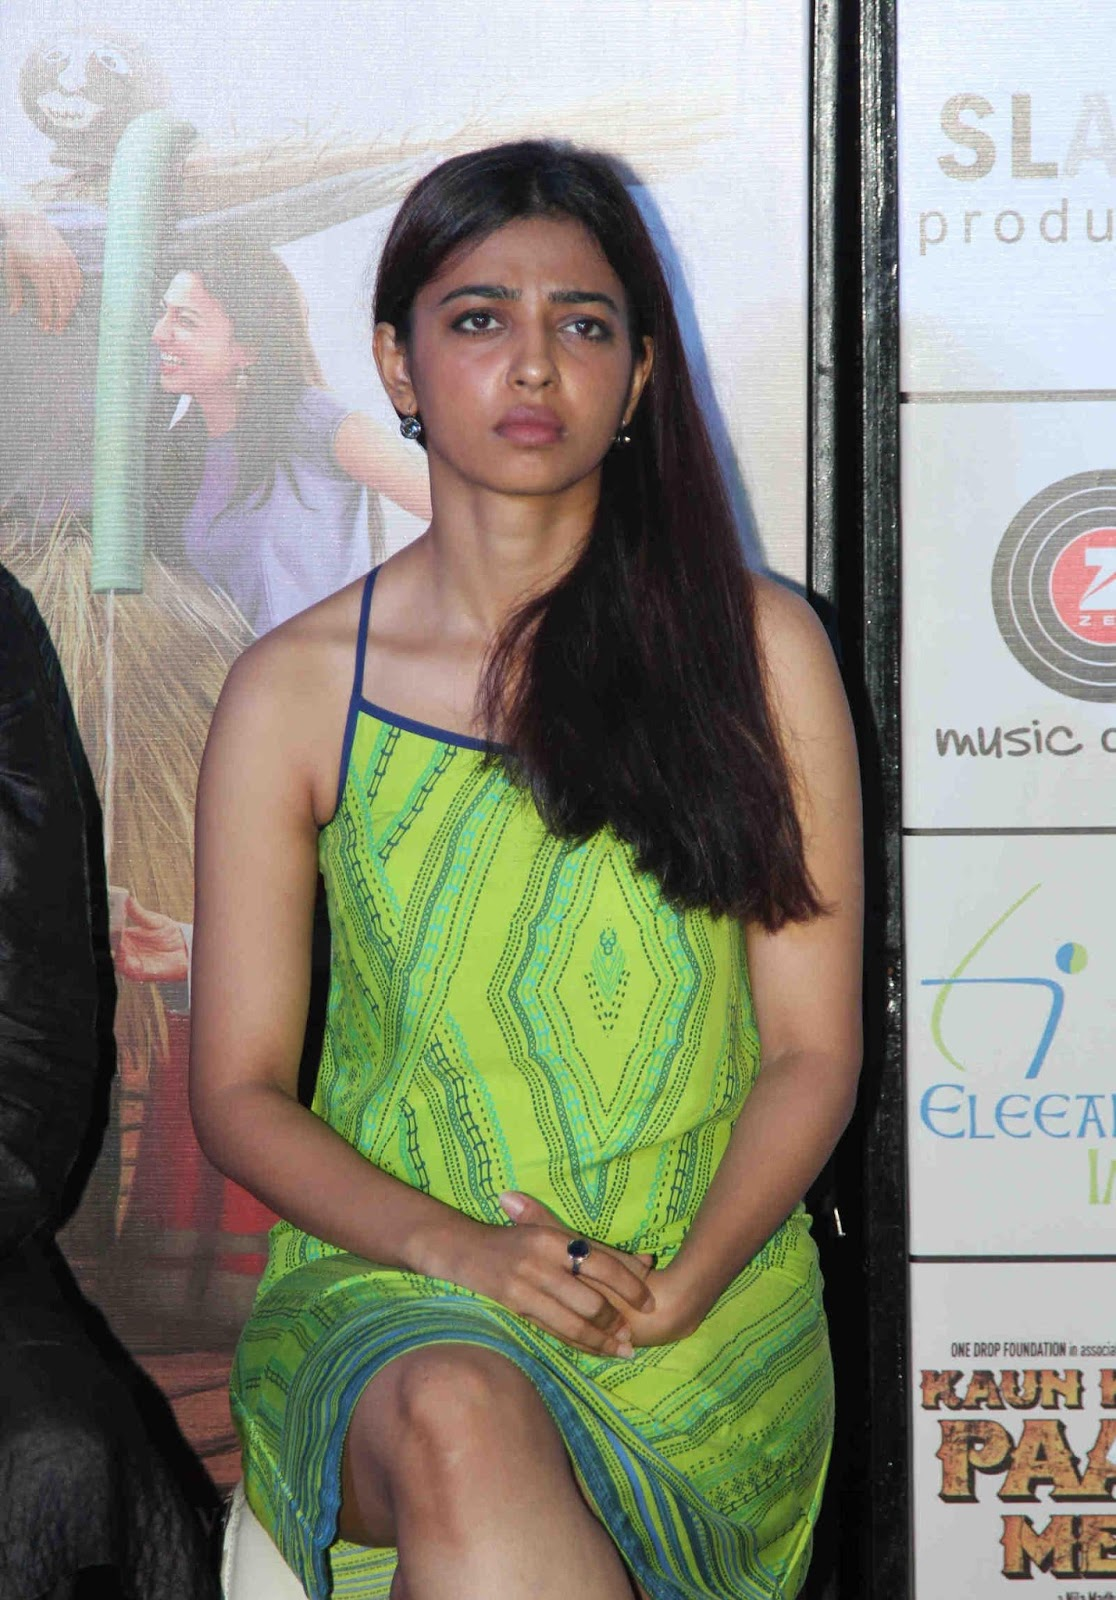 Radhika Apte Looks Super Sexy At Film 'Kaun Kitne Paani Mein' Trailer Launch In Mumbai